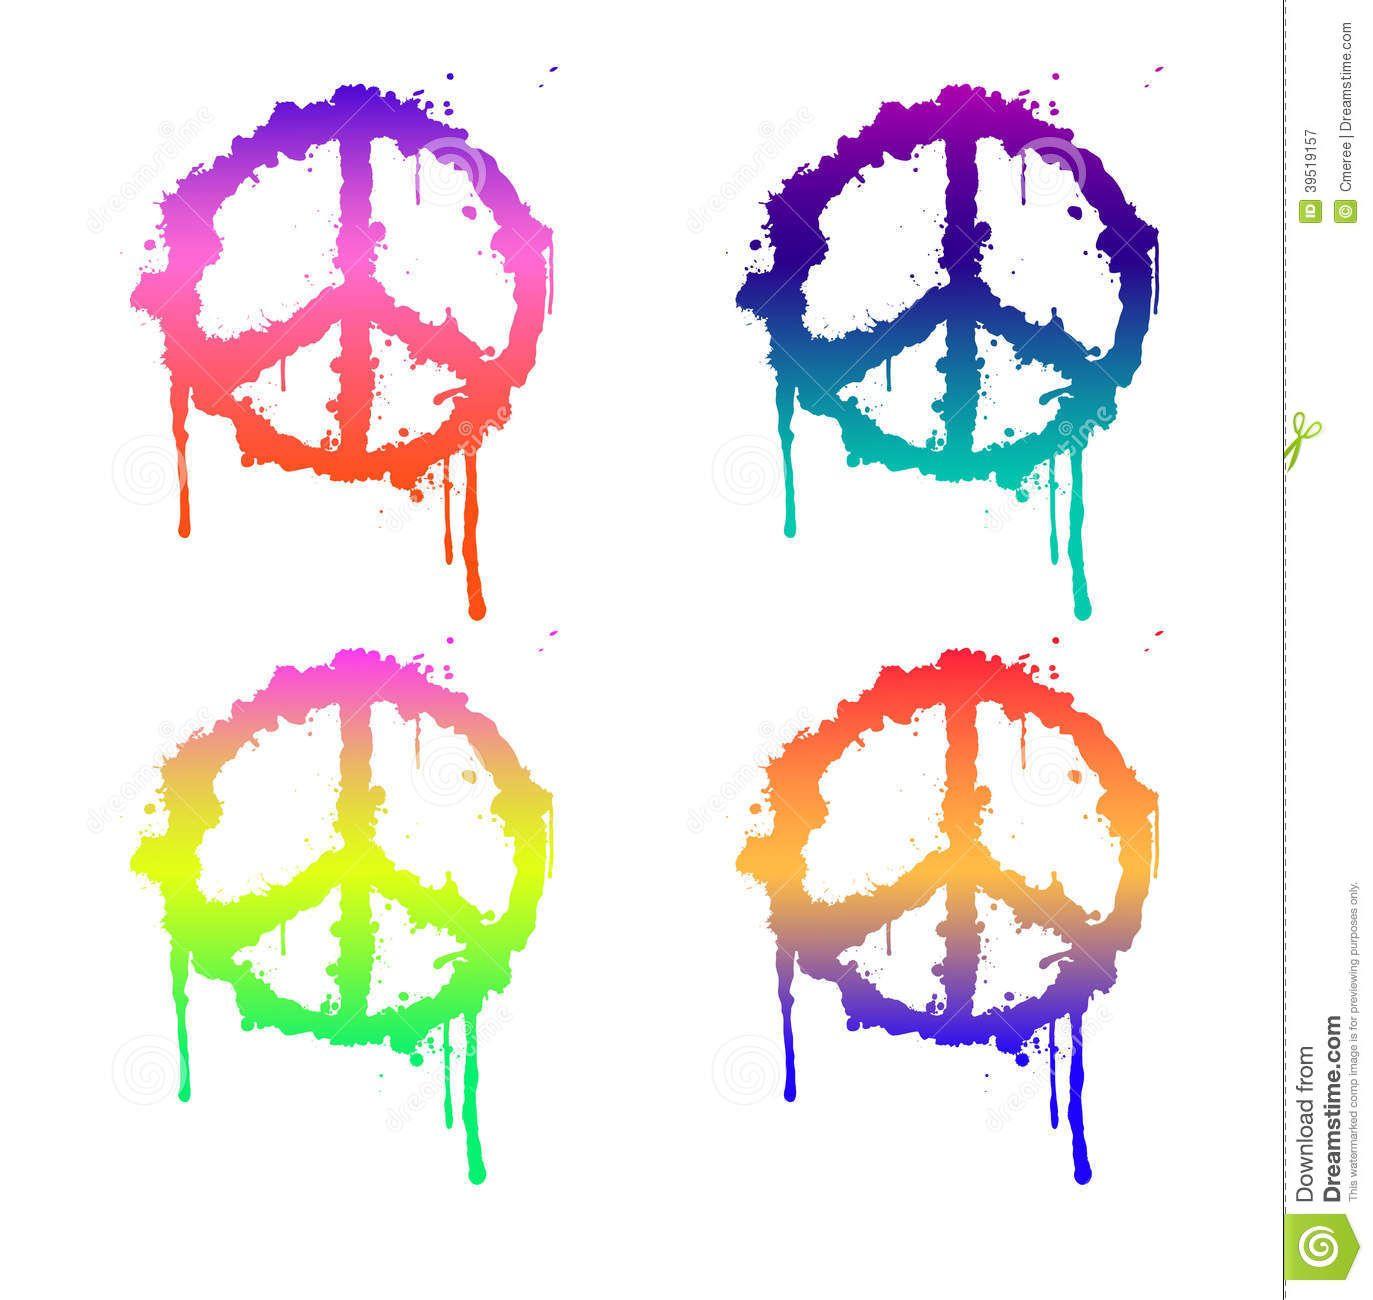 peace-sign-color-four-signs-differen-colours-39519157.jpg (1373×1300)